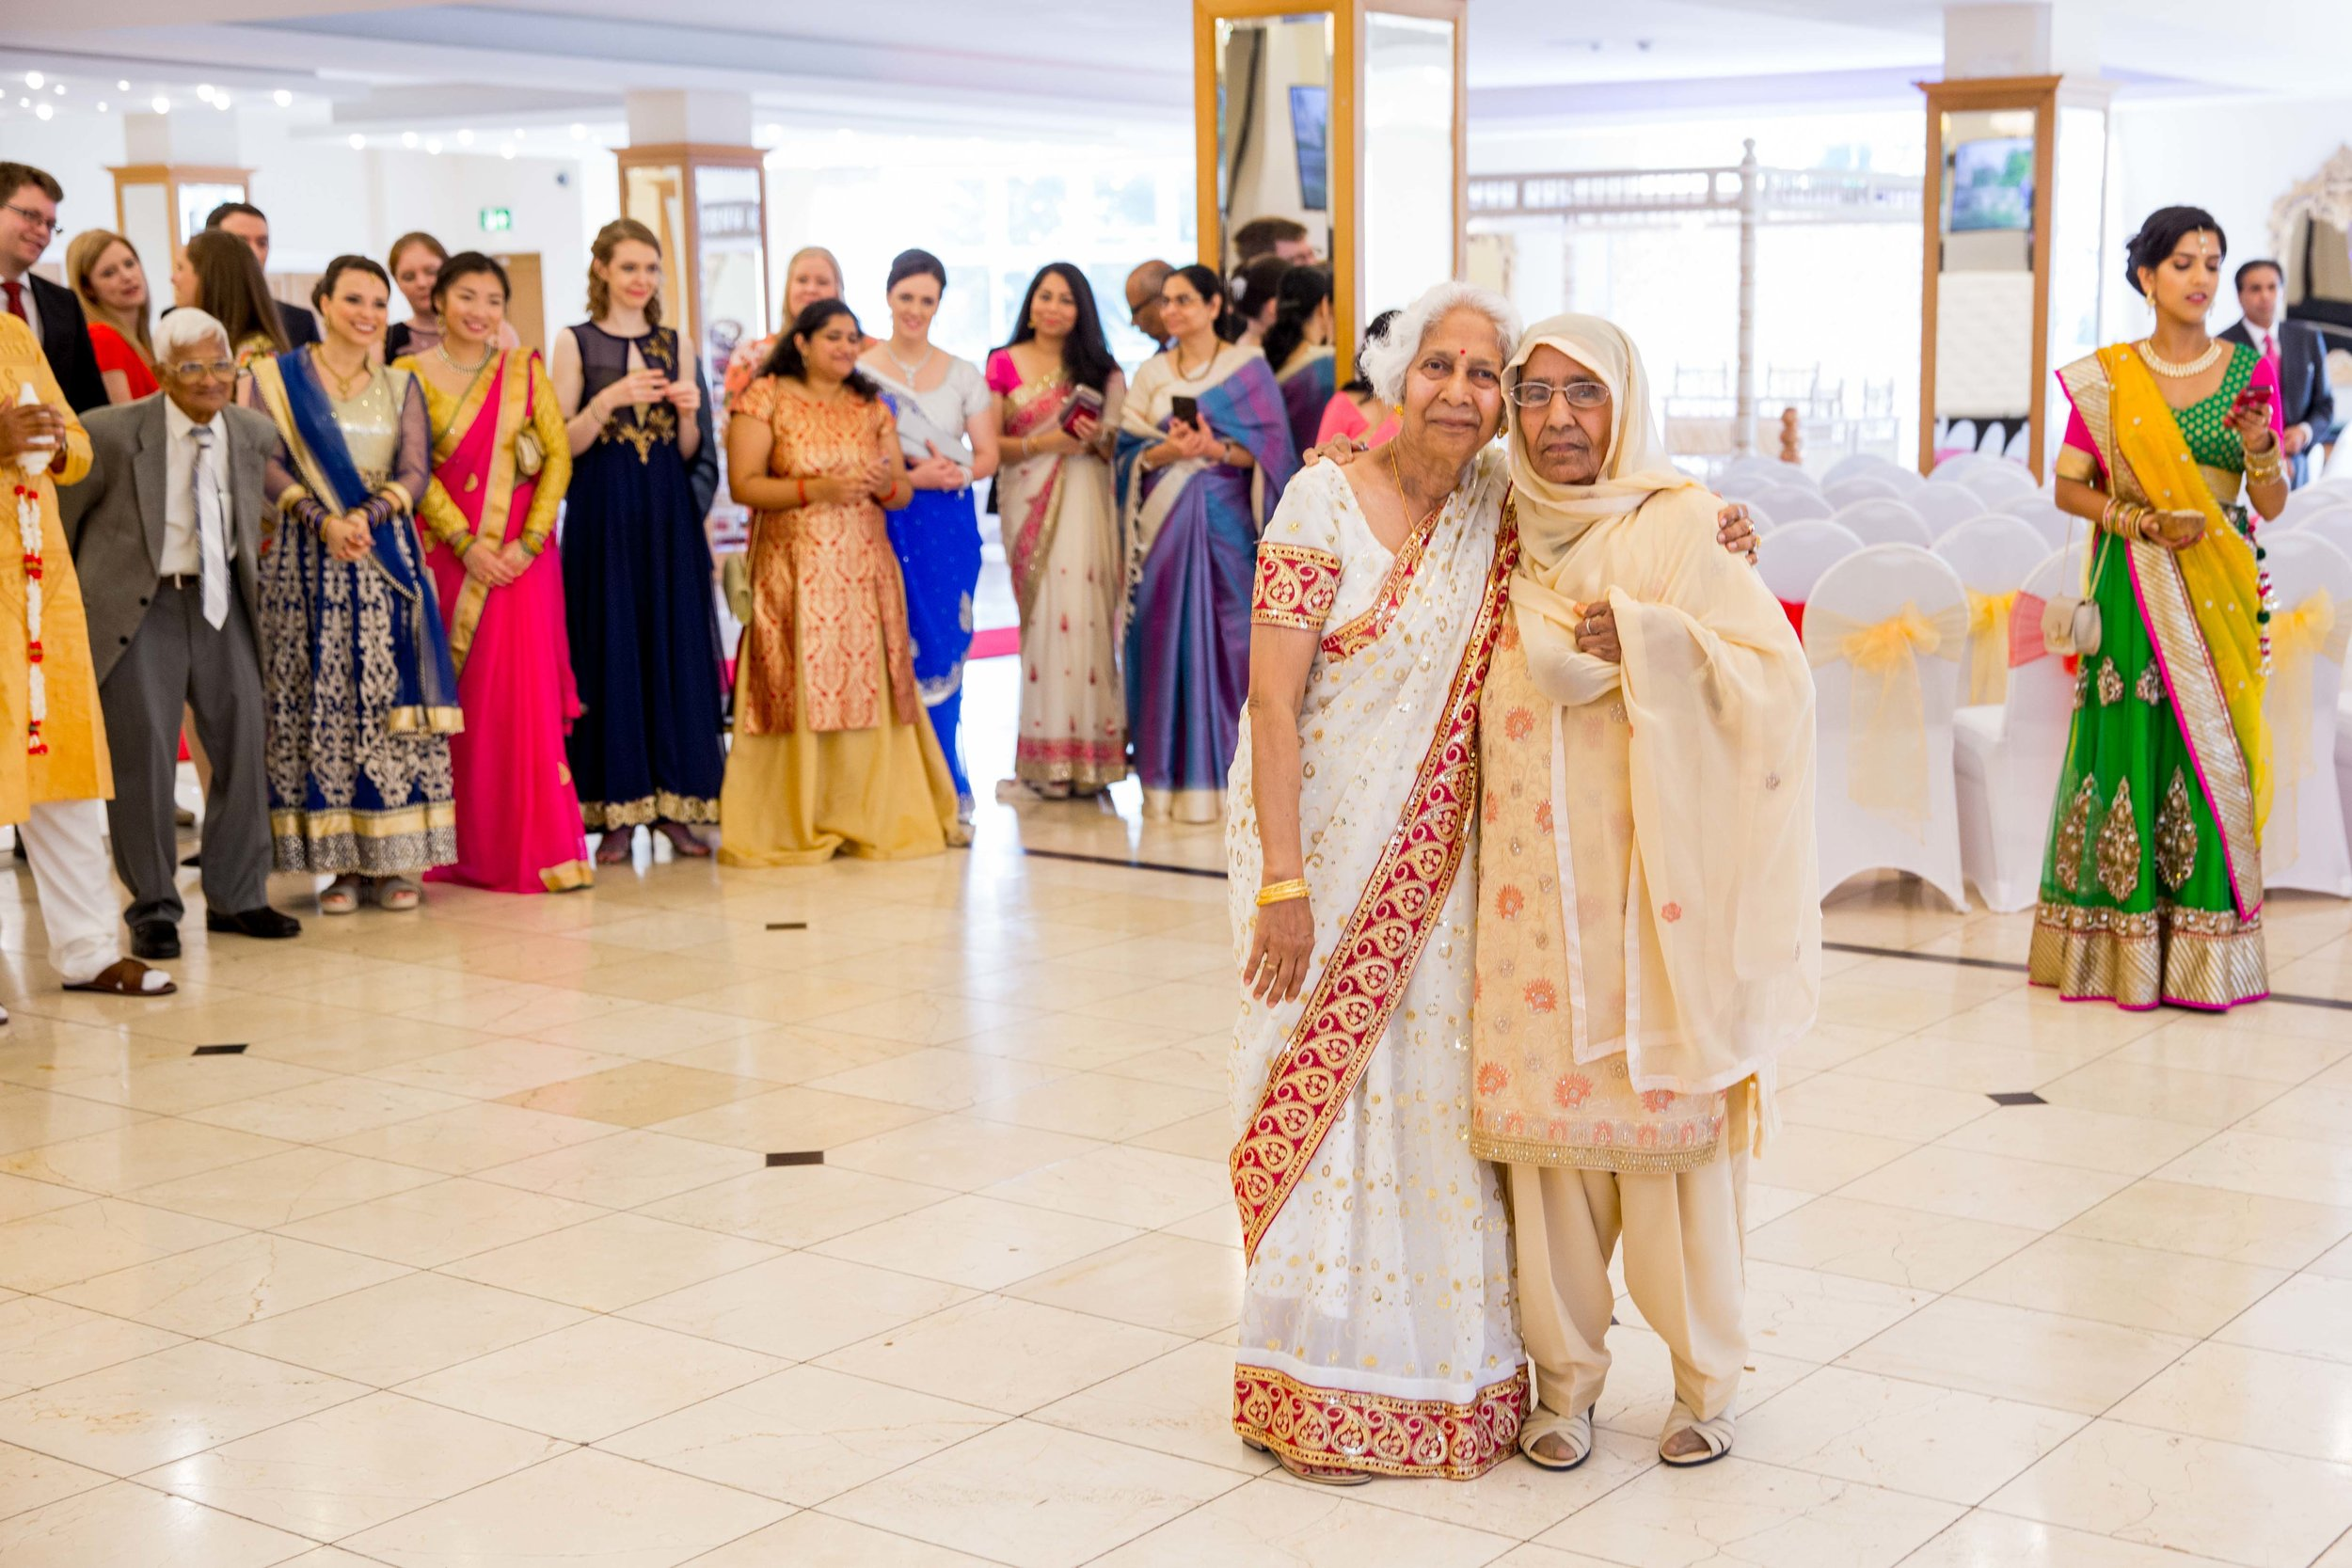 ramada-park-hall-hotel-birmingham-wolverhampton-hindu-wedding-asian-wedding-photography-natalia-smith-photography-15.jpg